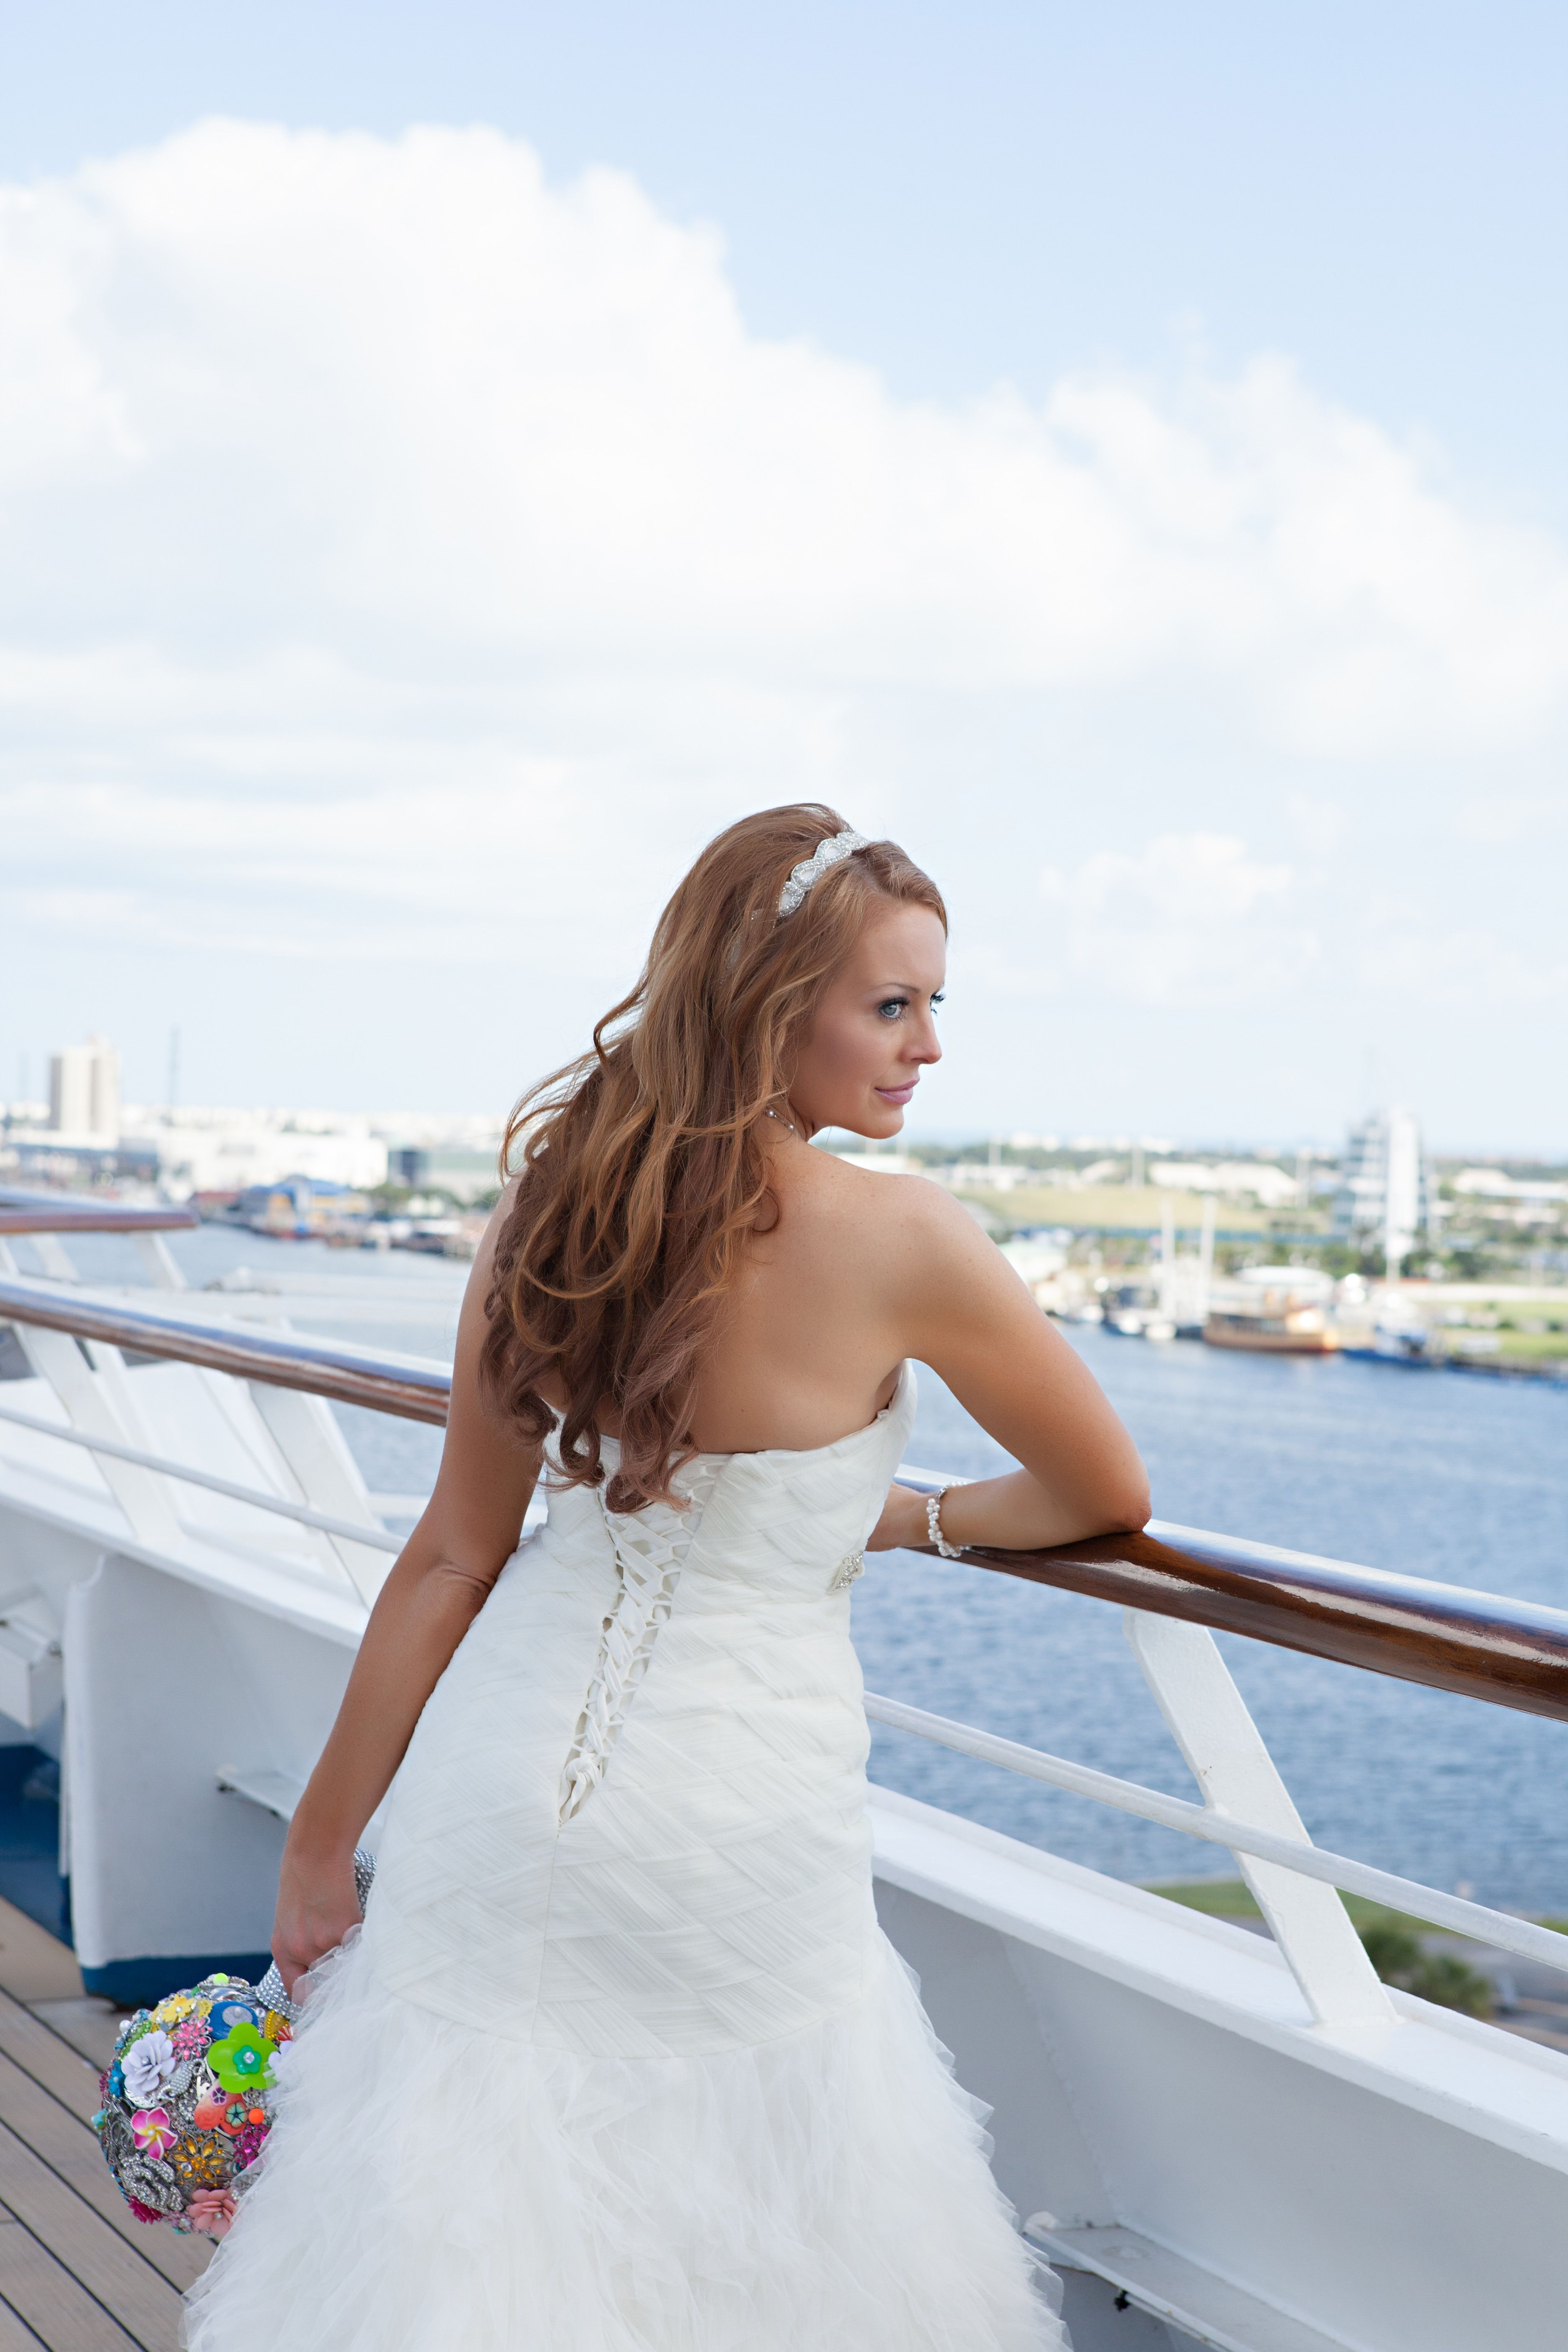 Brooch bouquet Carnival Cruise ship Wedding Carnival